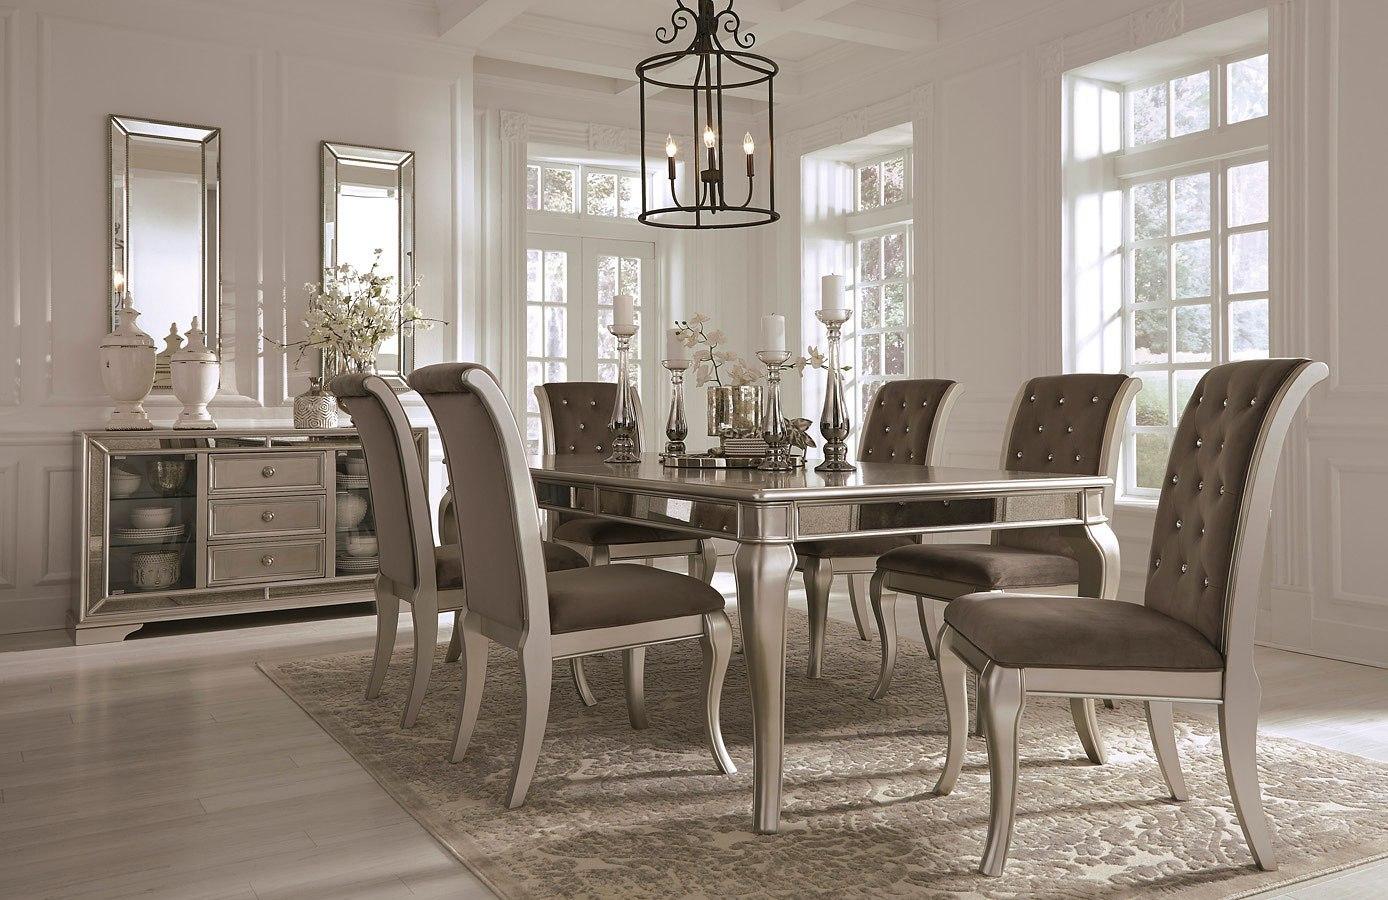 Birlanny Extension Dining Room Set Signature Design | Furniture Cart